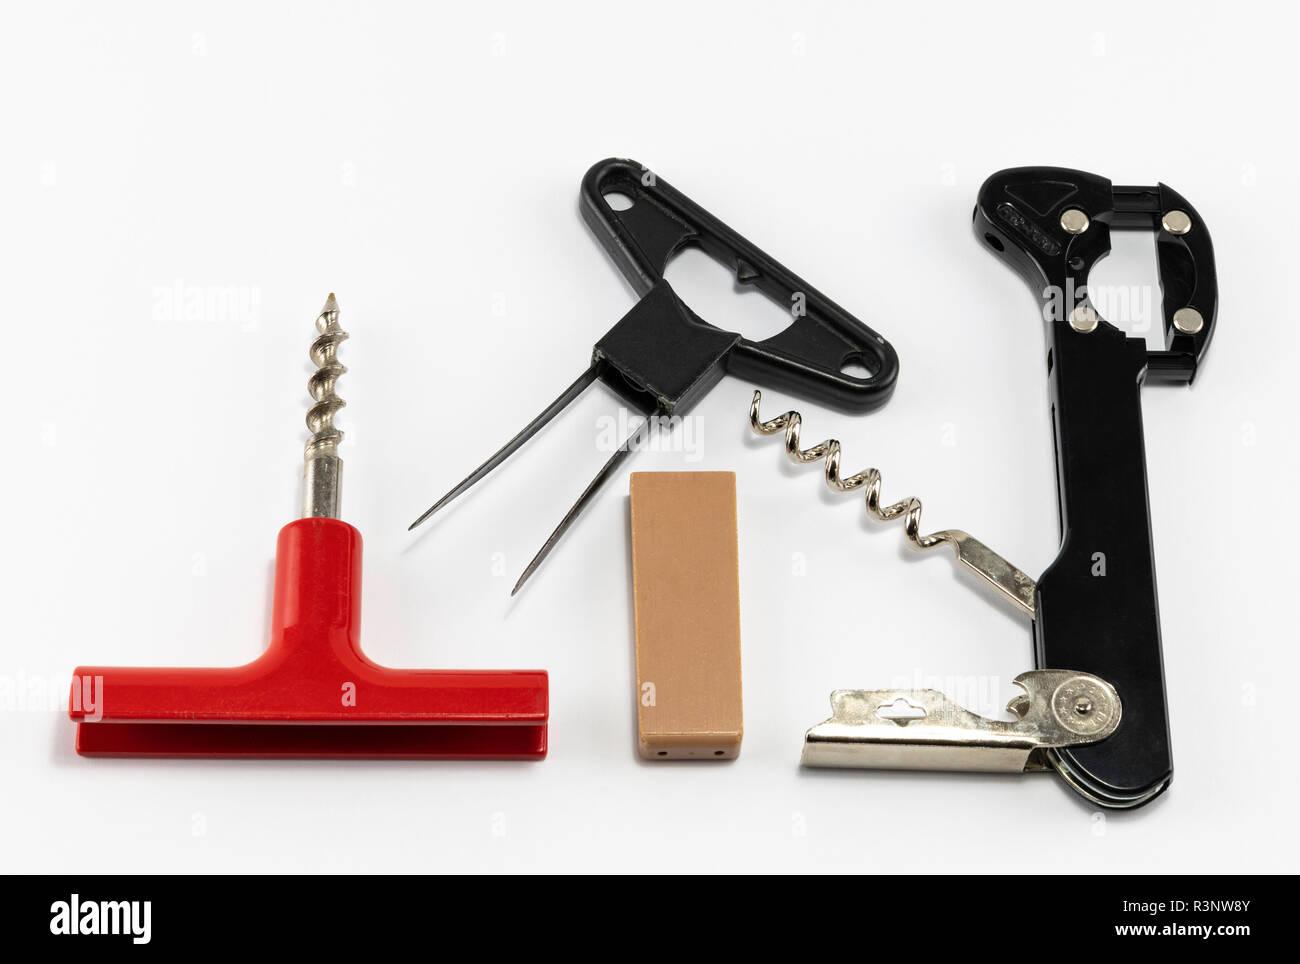 Cork Removers - Stock Image